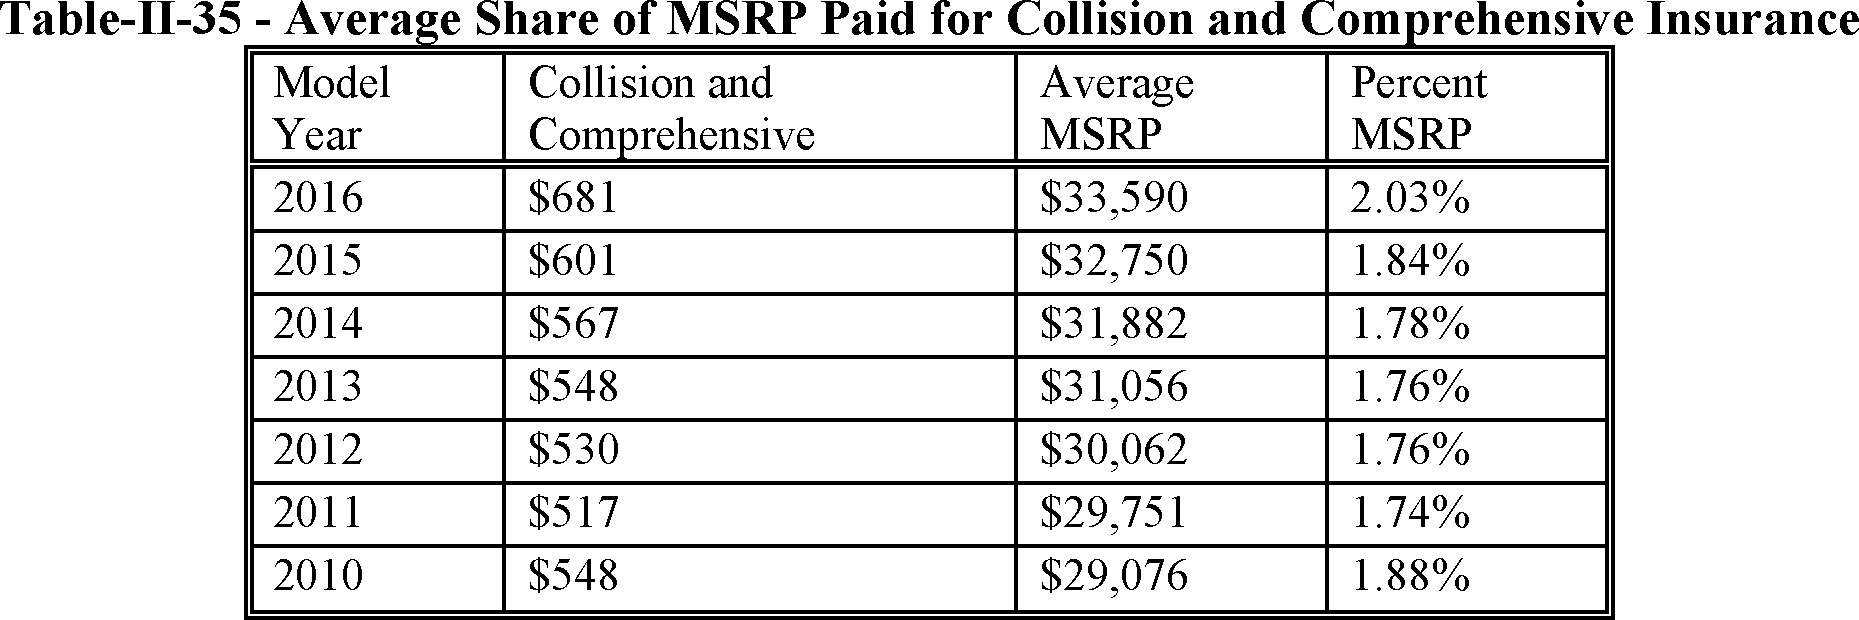 Hydrogen Car Engine Diagram Likewise Diagram Of 2010 Buick Lacrosse V6